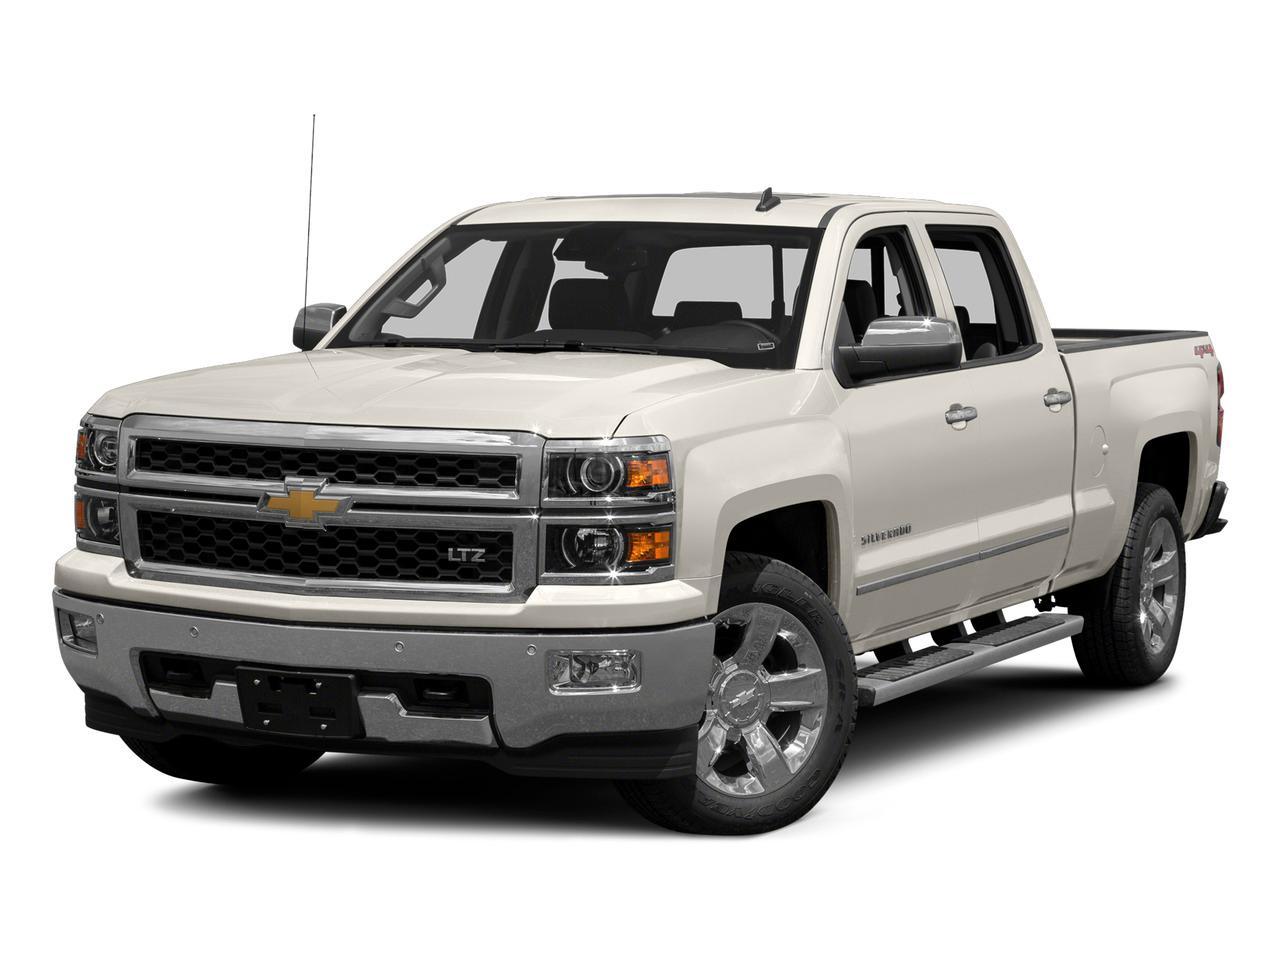 2015 Chevrolet Silverado 1500 Vehicle Photo in Odessa, TX 79762